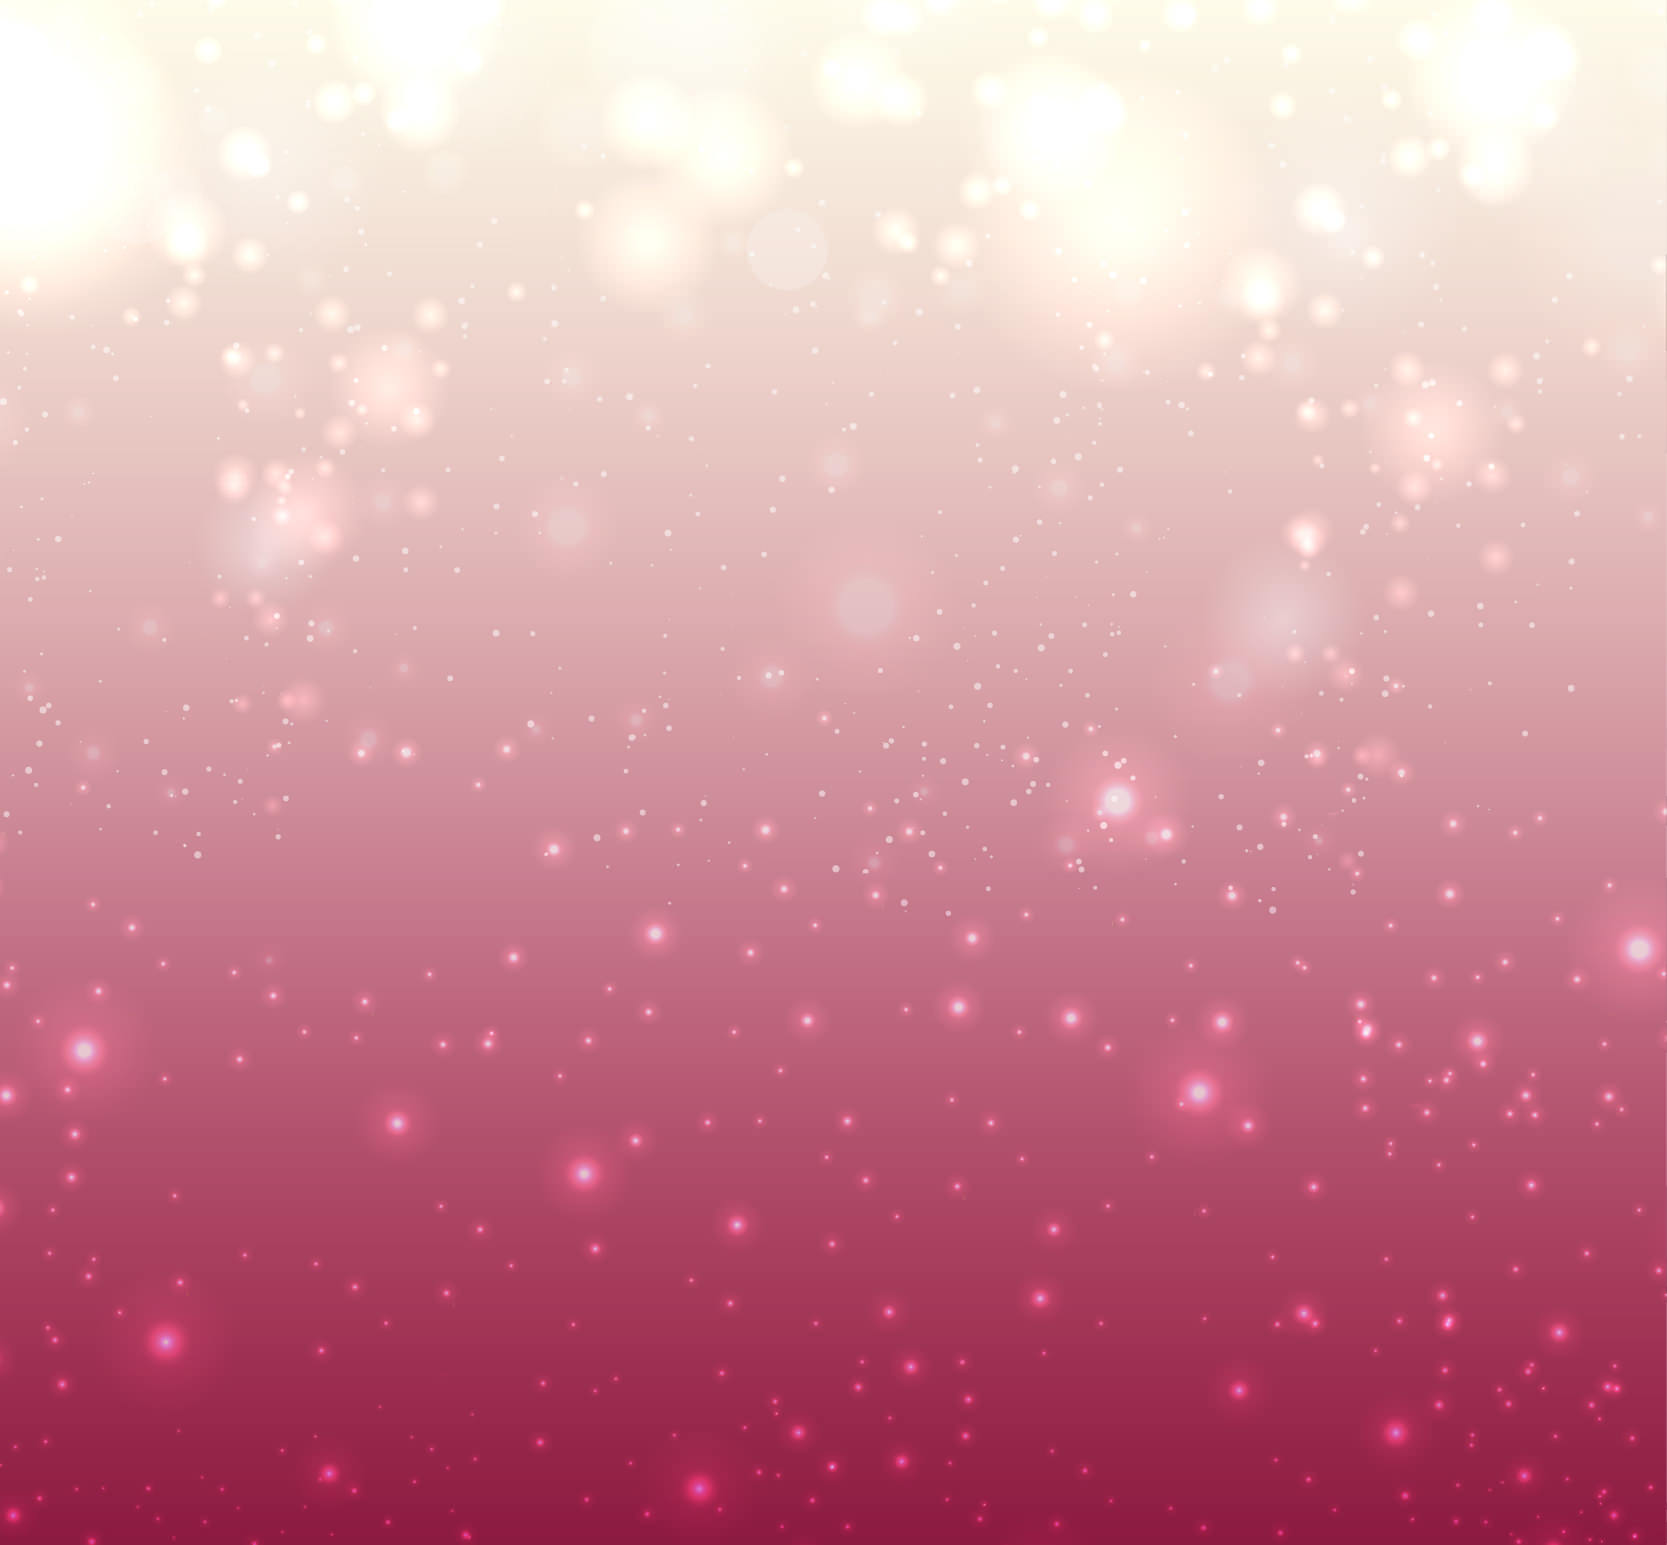 bright bokeh pink background